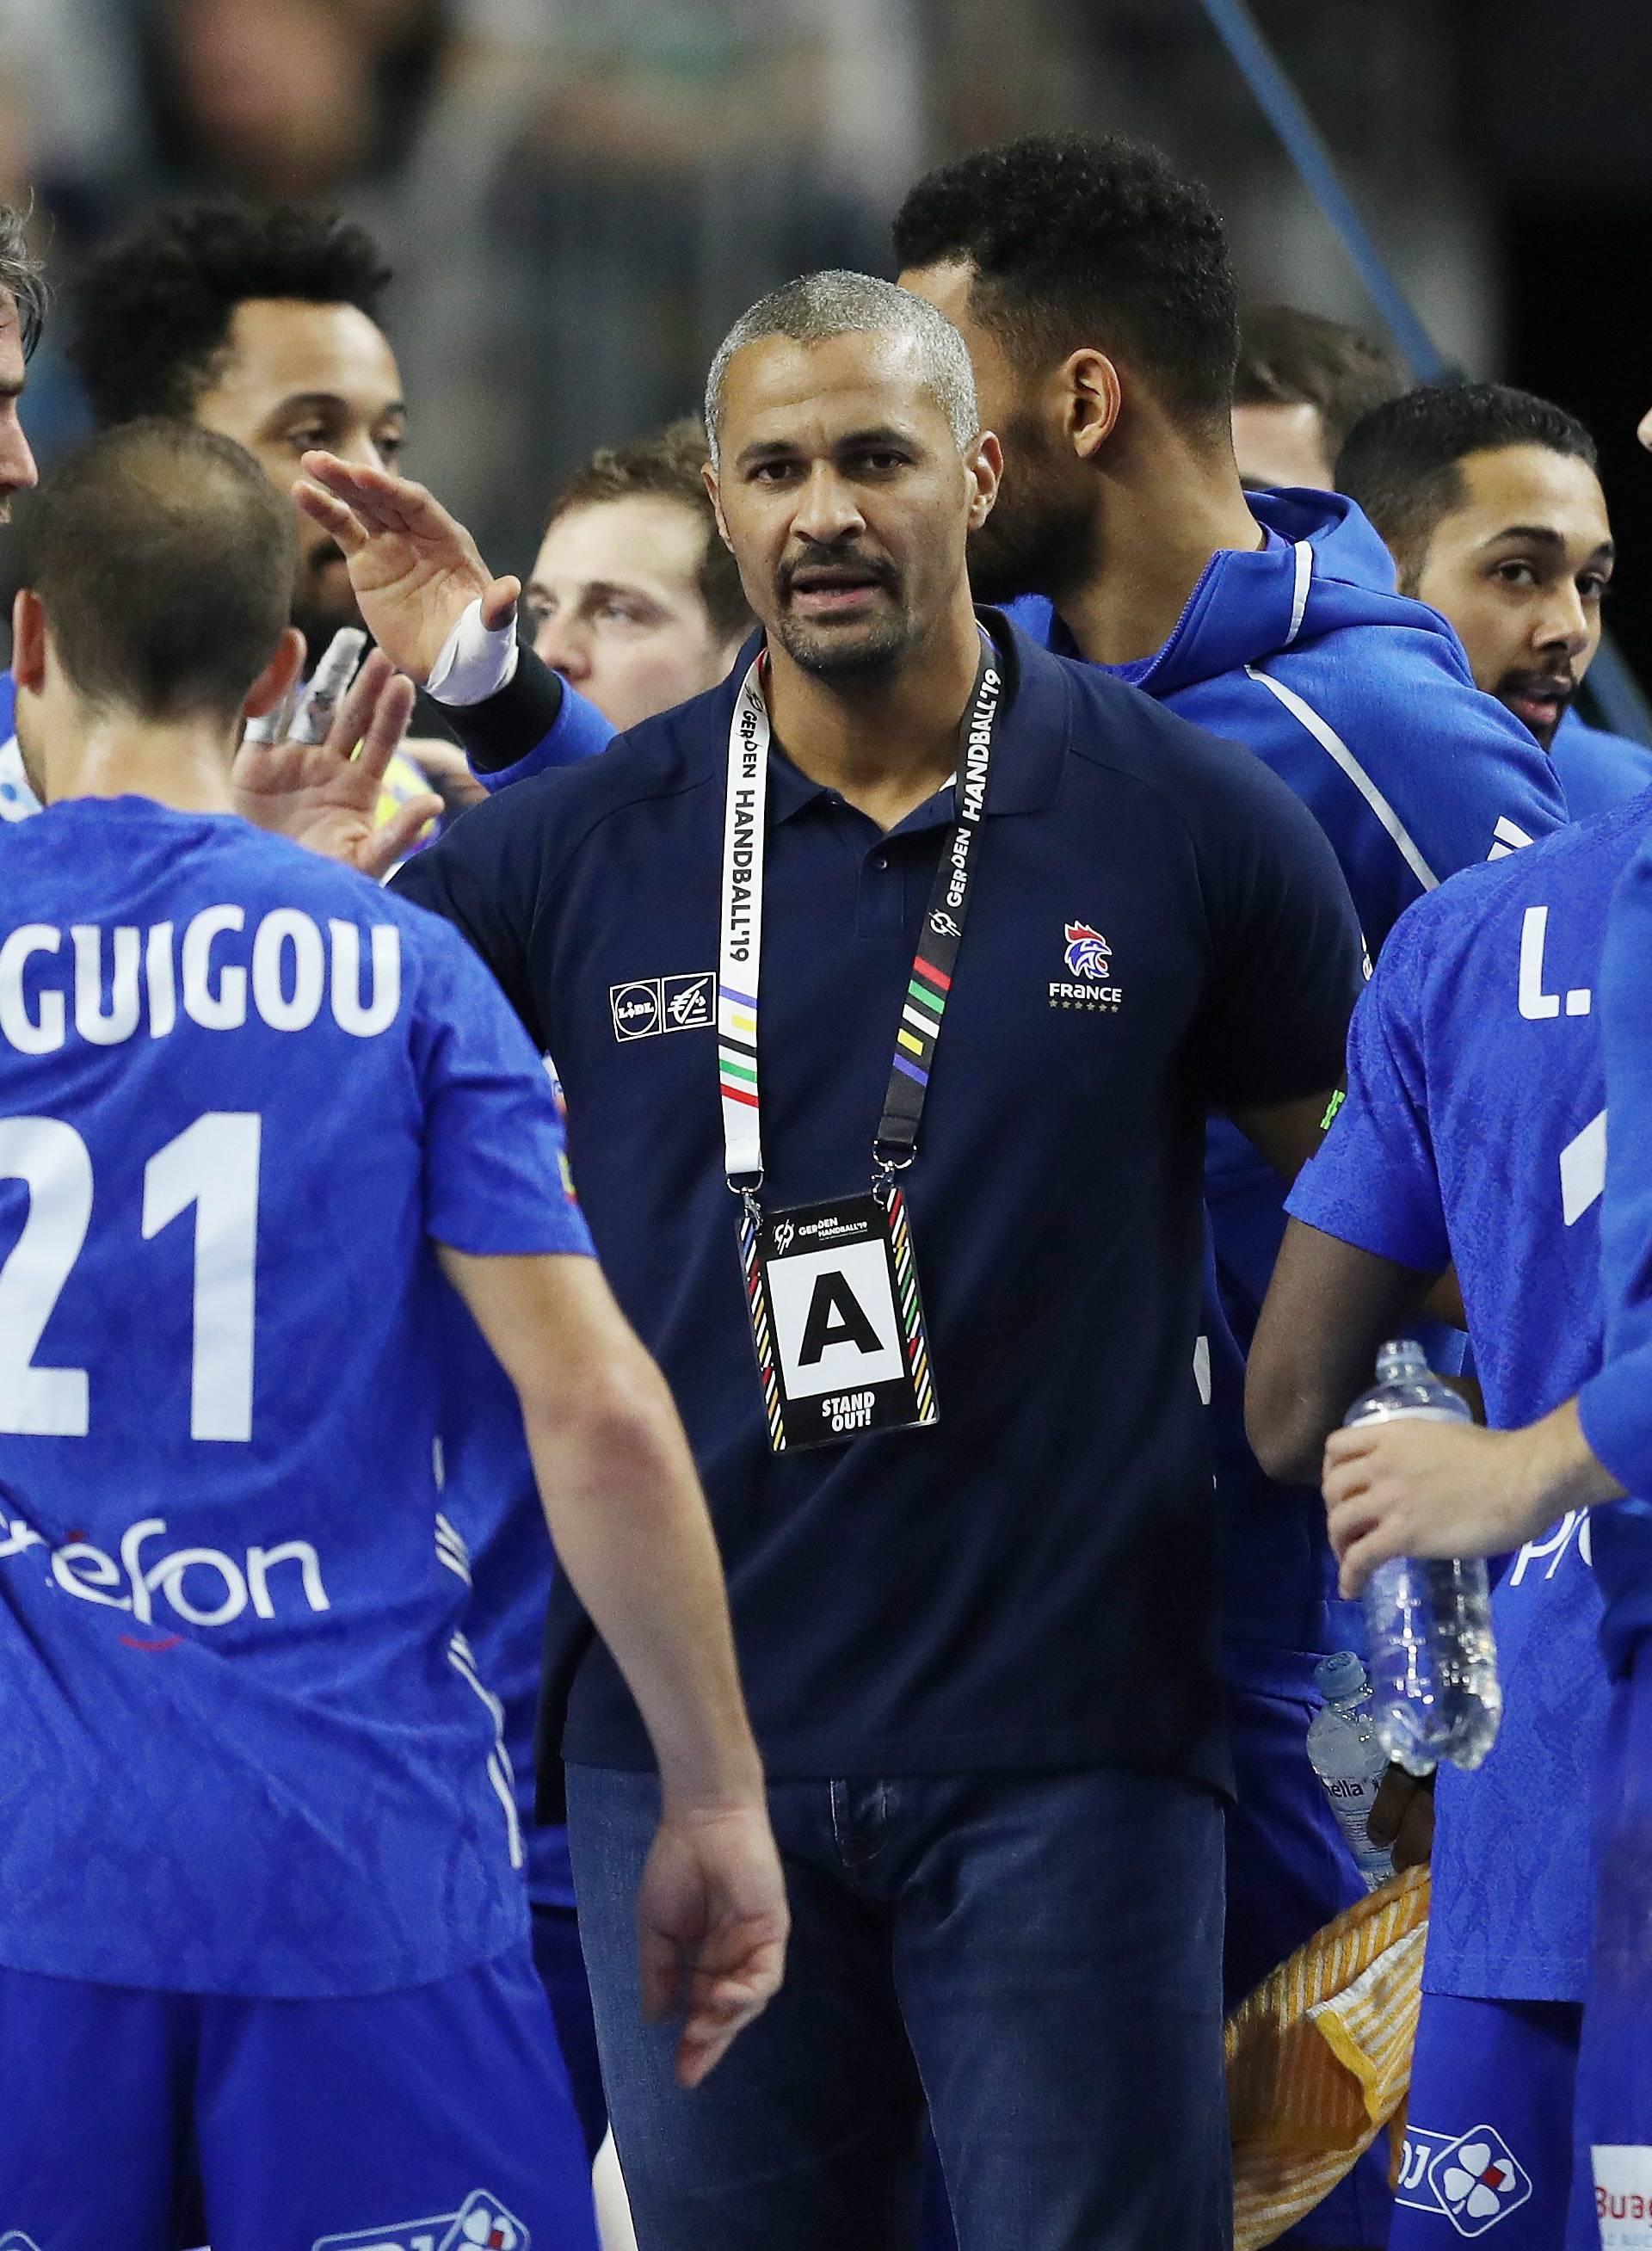 firo: 19.01.2019, Handball: World Cup World Cup Main Round France - Spain